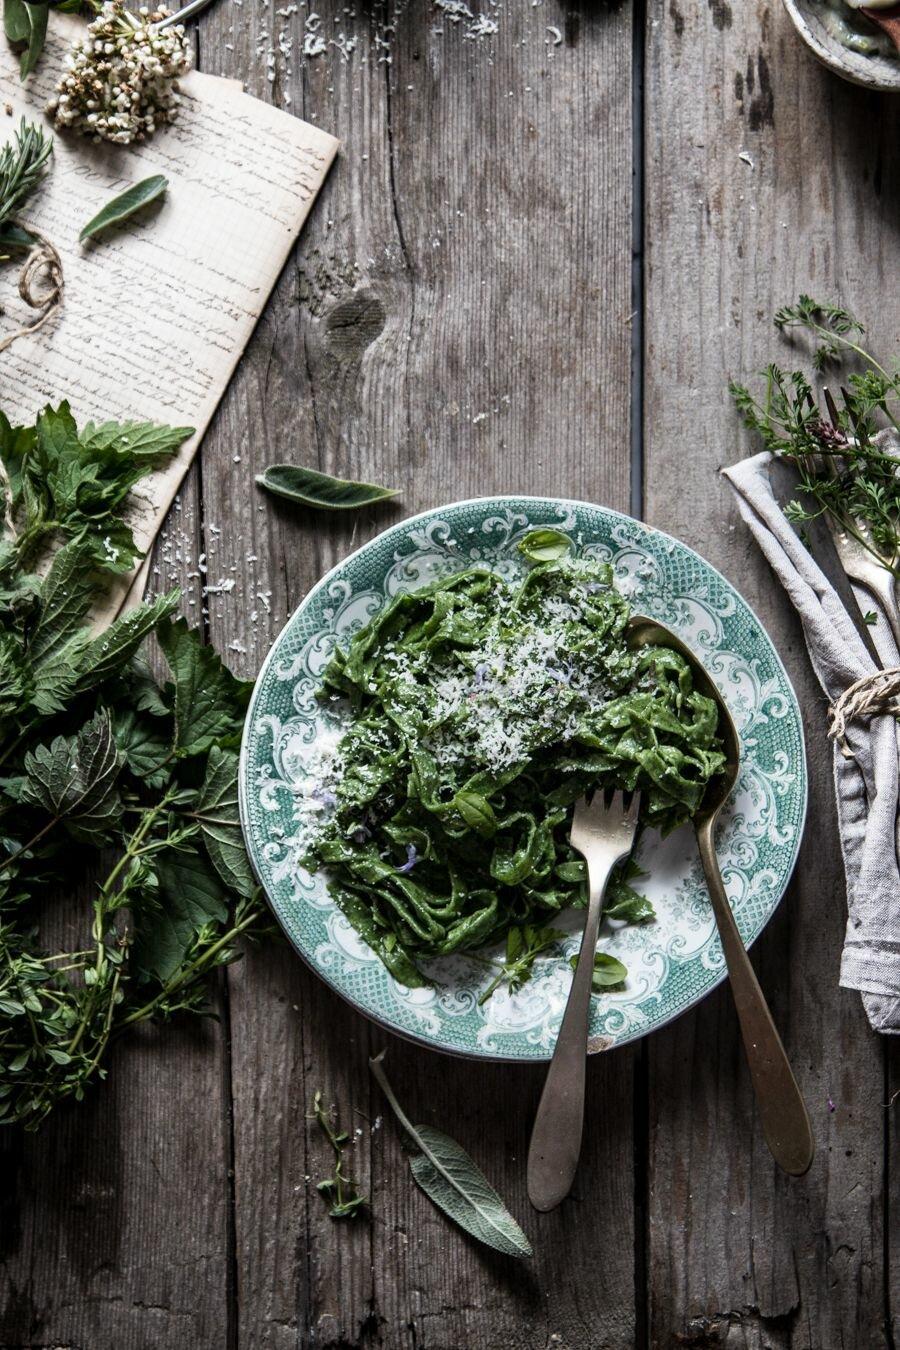 Еда из крапивы, рецепты блюд из крапивы